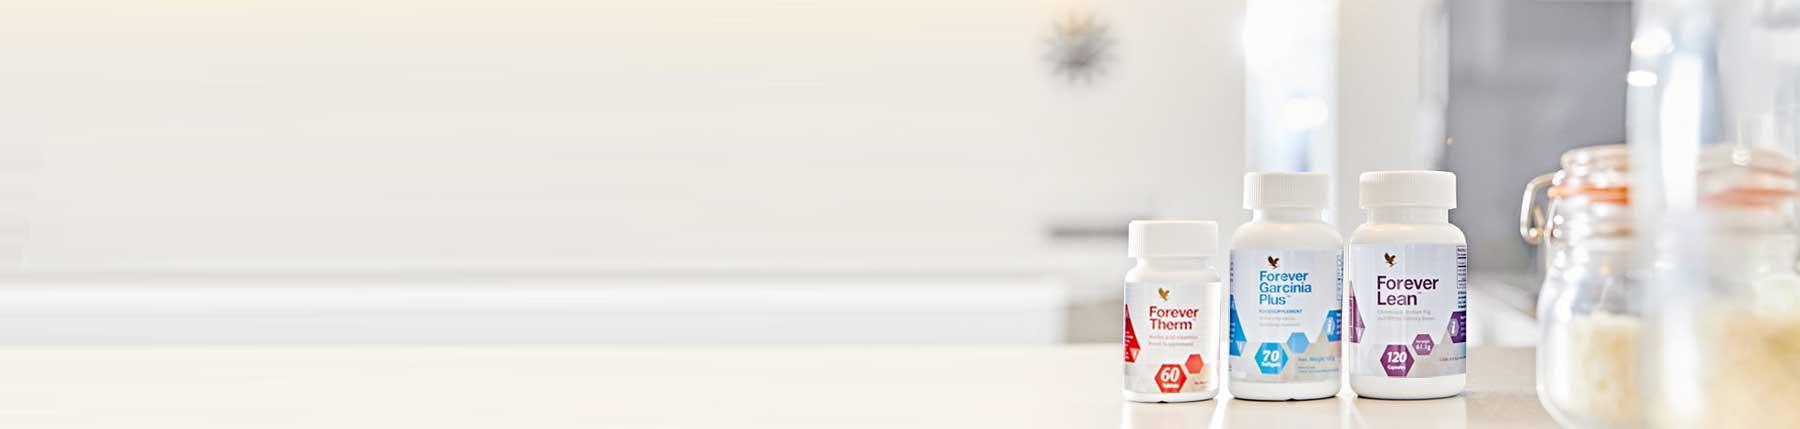 Forever Living Aloe Vera proizvodi Dodaci ishrani - Suplementi cena prodaja